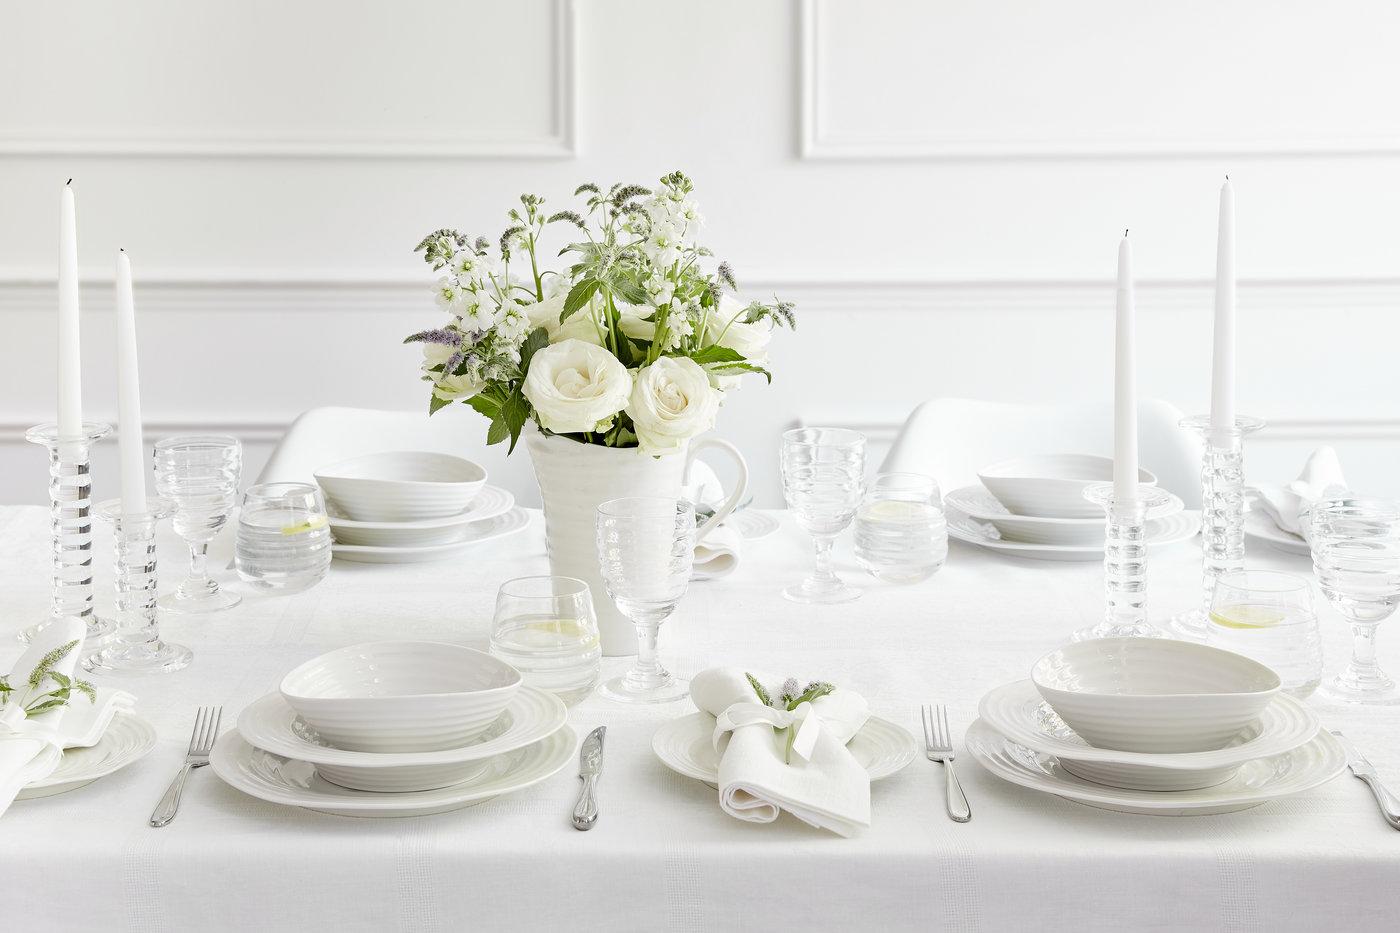 Portmeirion Sophie Conran Servise Tableware Sorgenfri